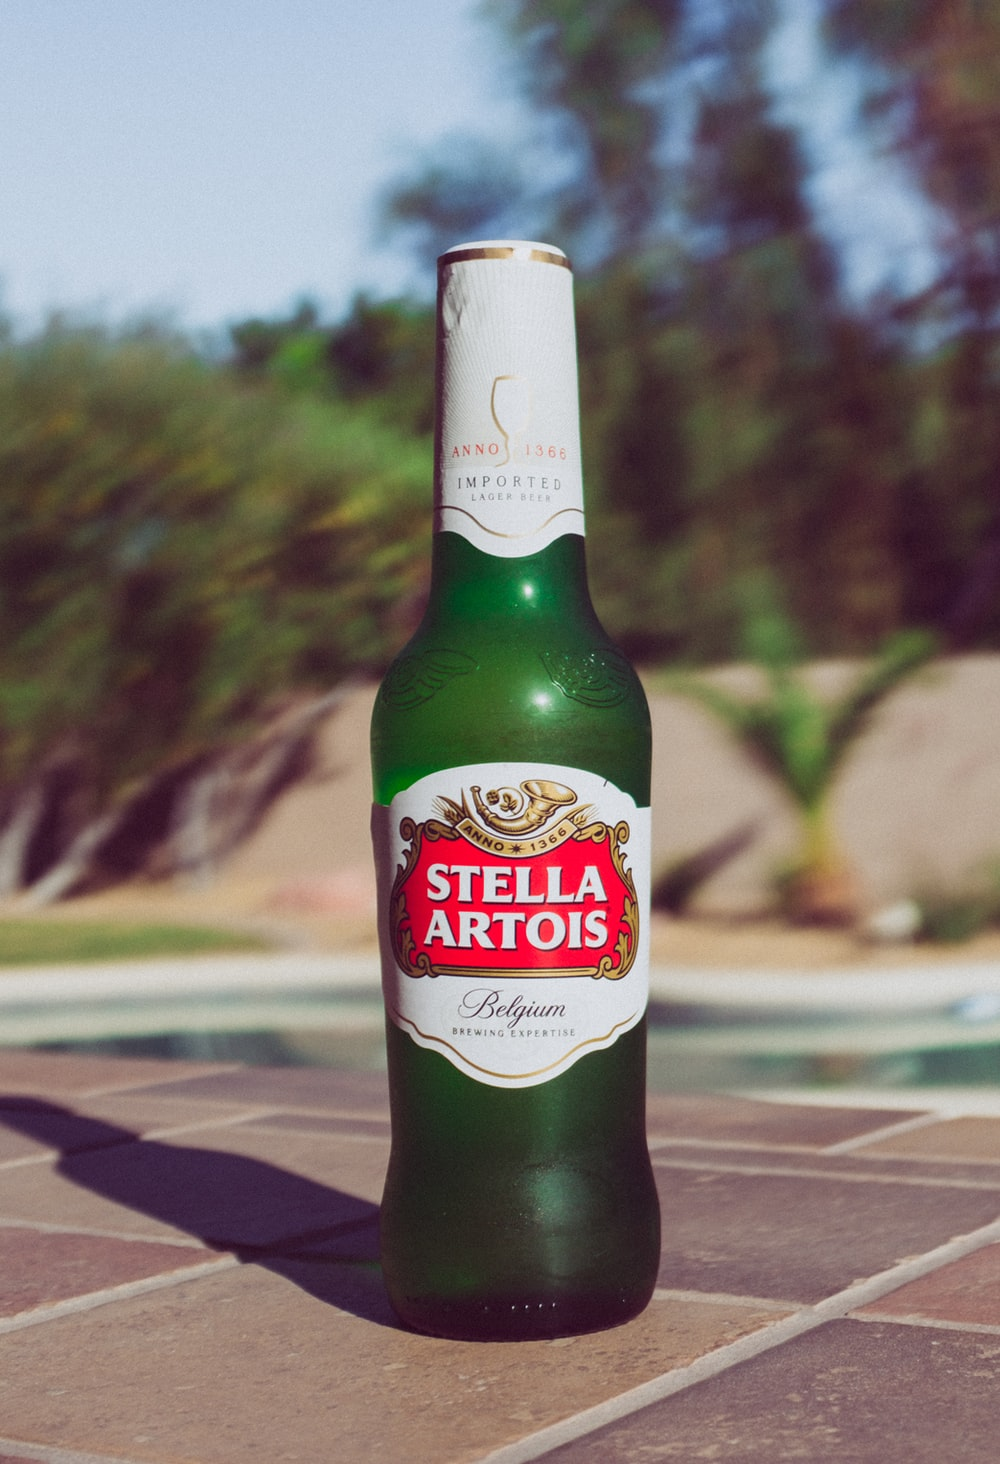 selective focus photography of Stella Artois bottle on beside pool